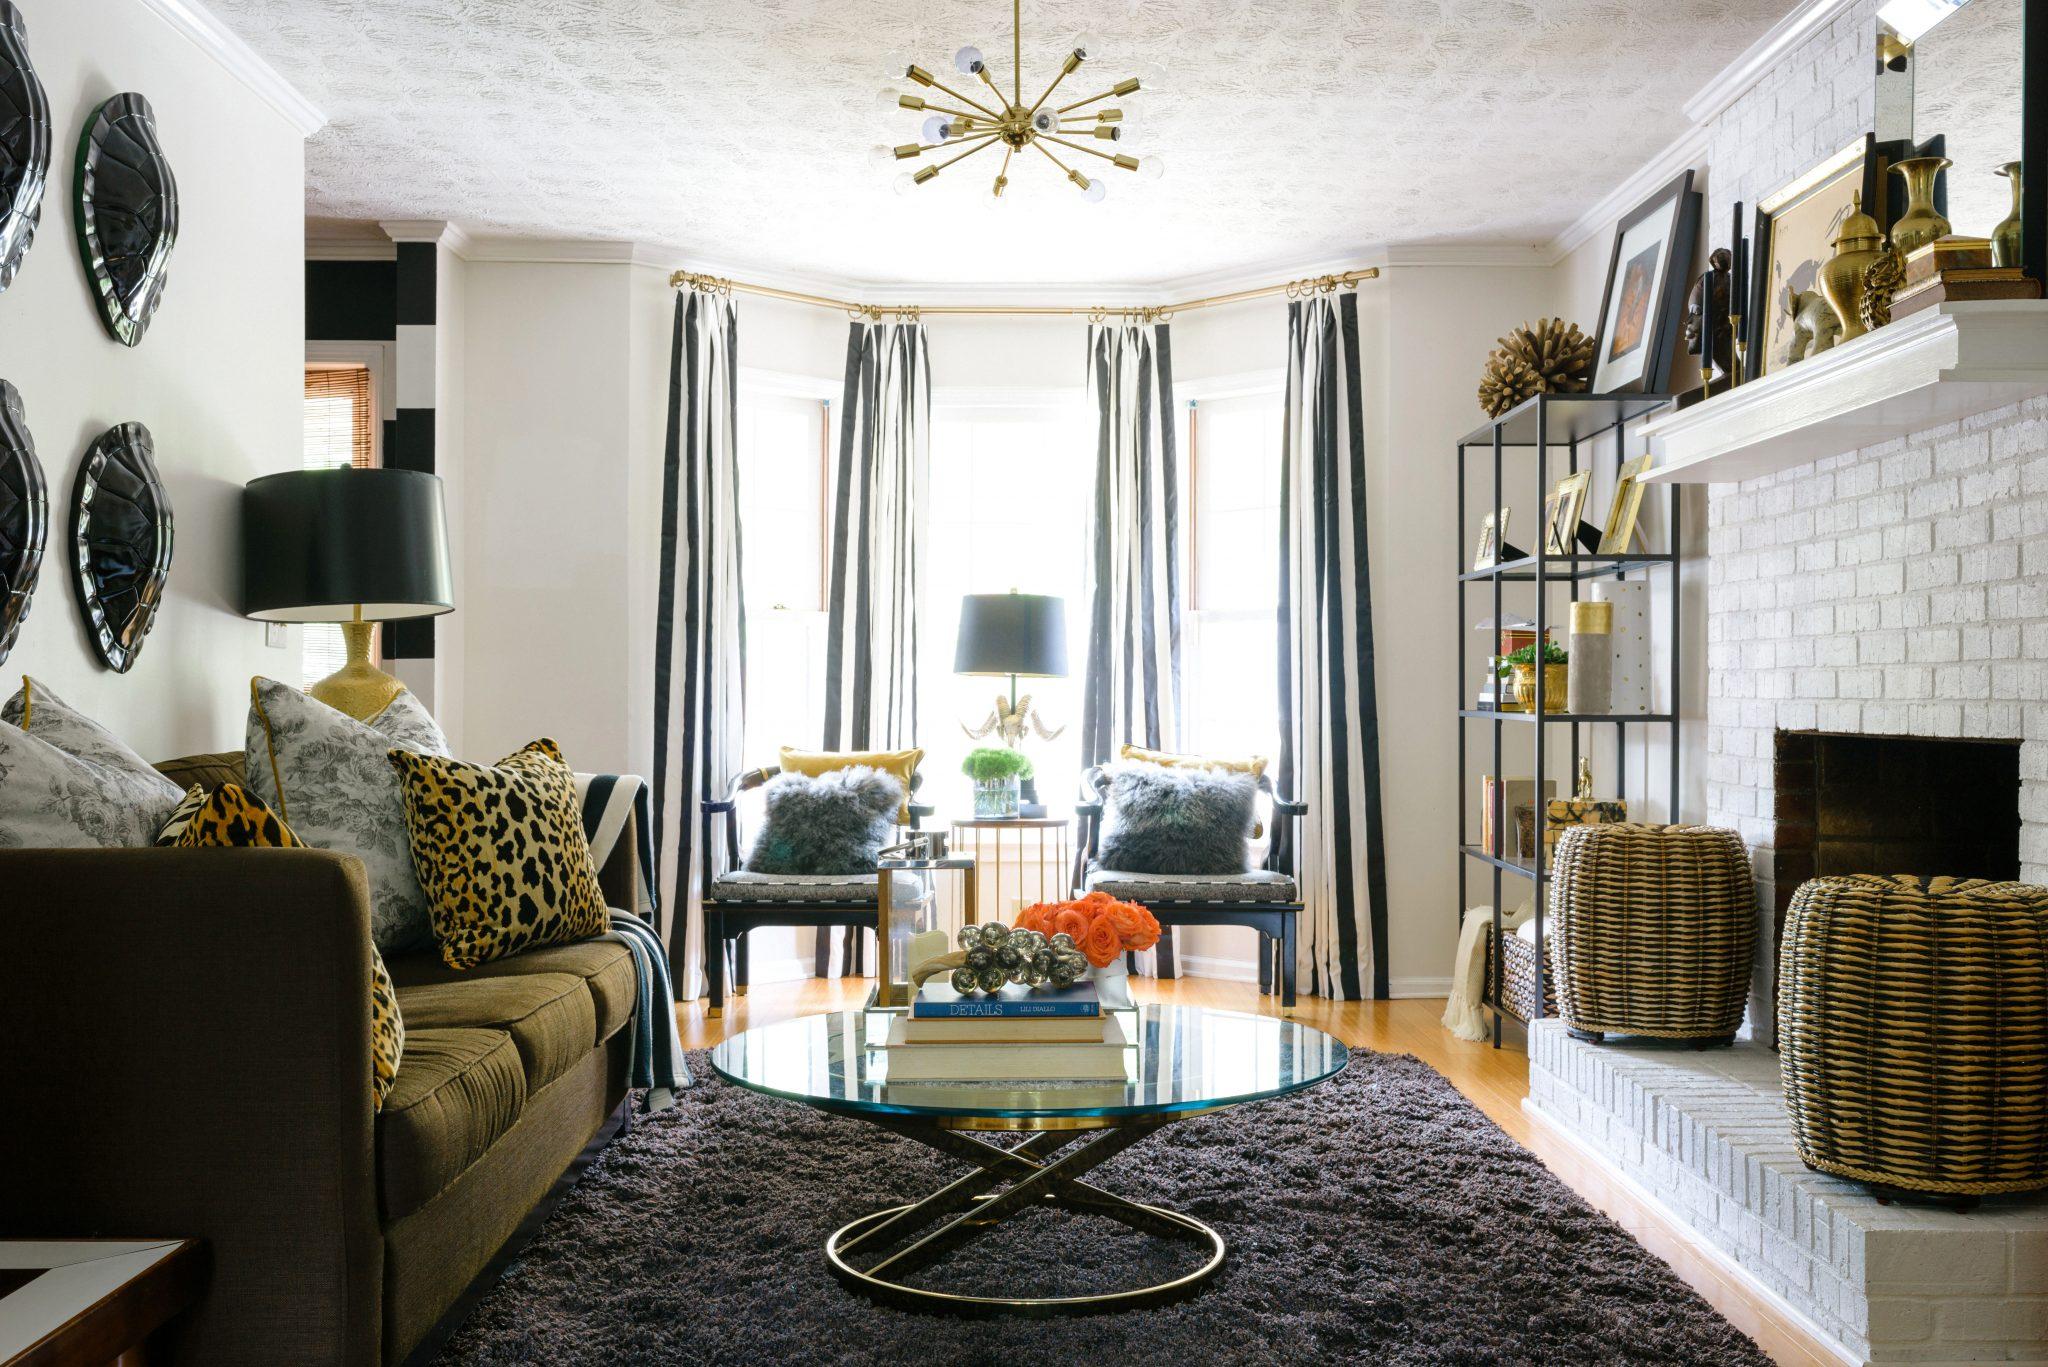 Peek Inside: Interior Designer Dayka Robinson's Home